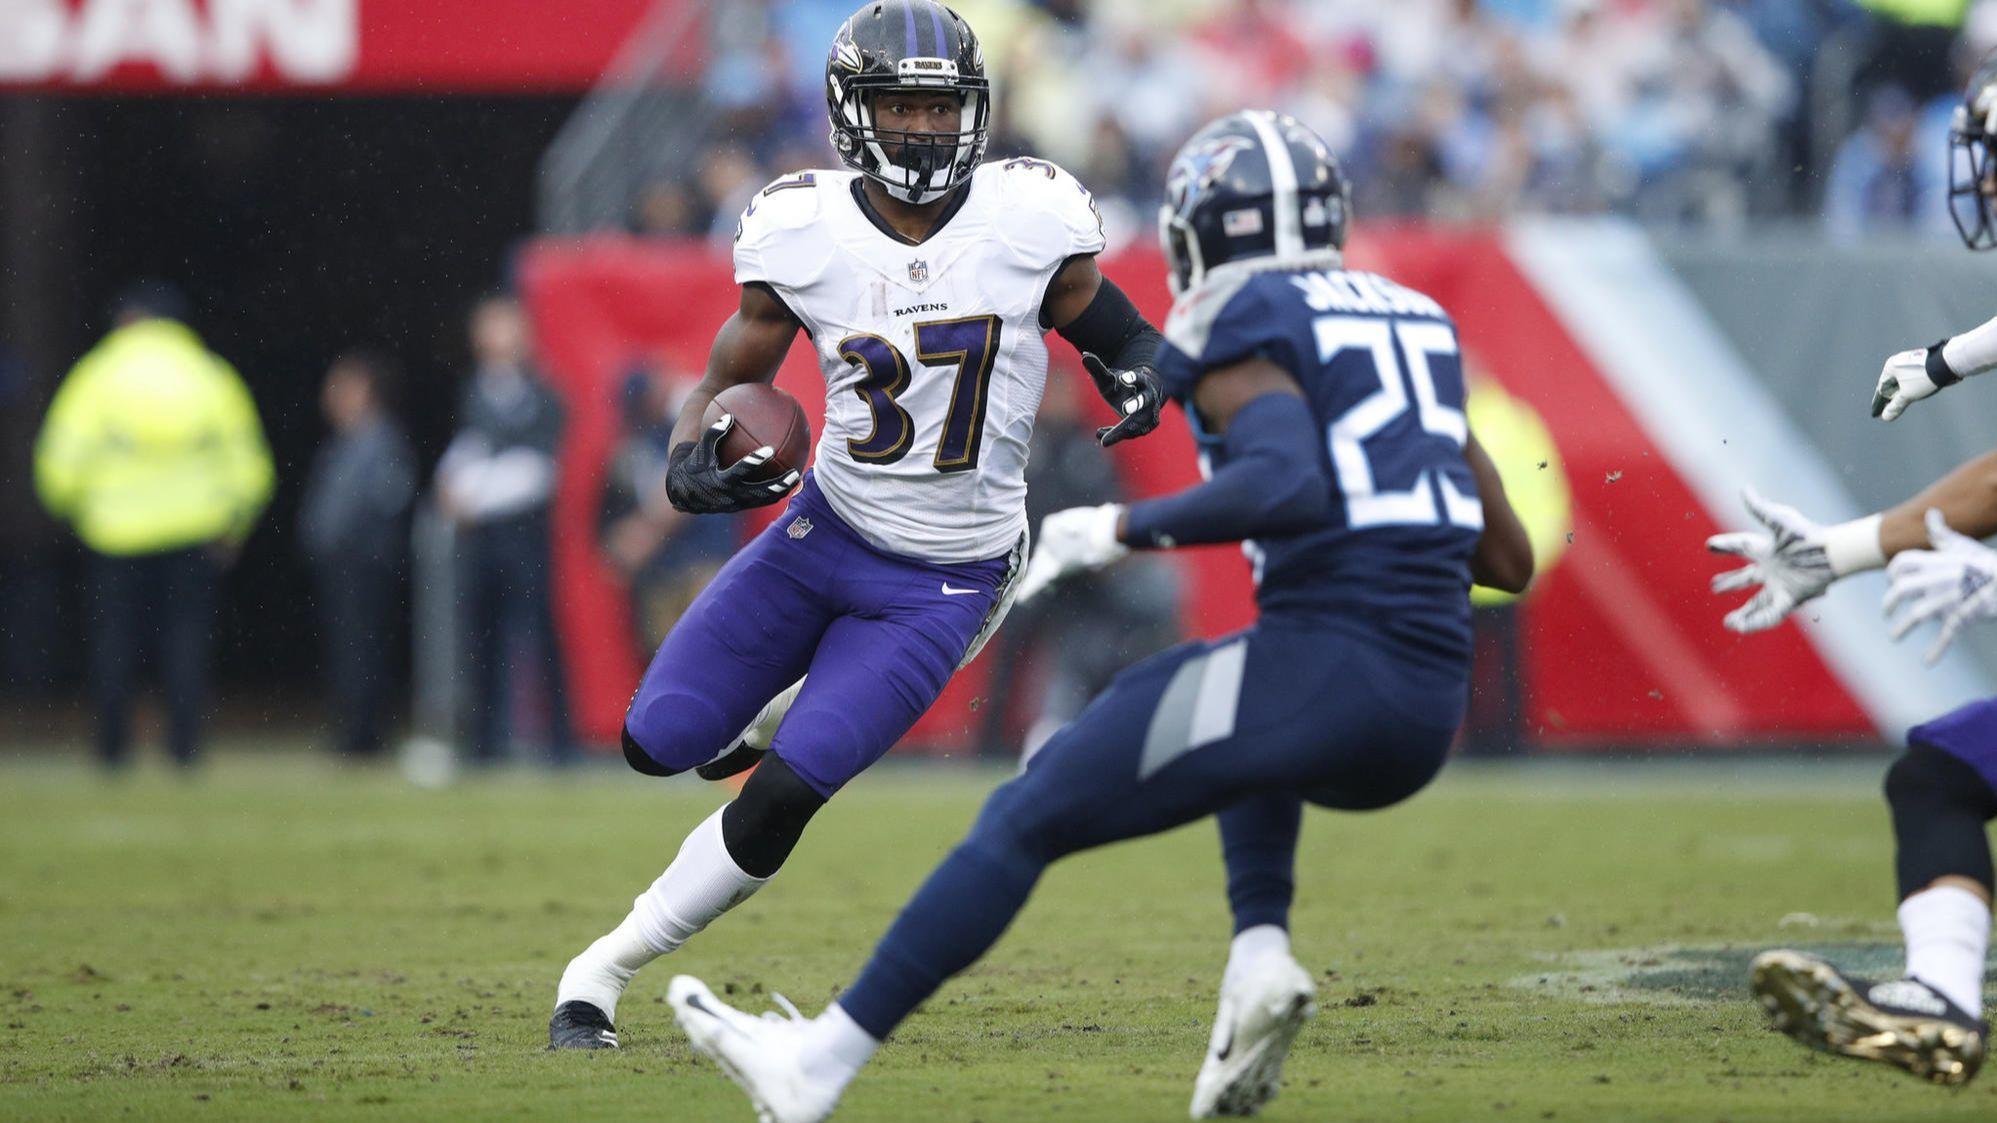 Bs-sp-ravens-titans-third-downs-20181014